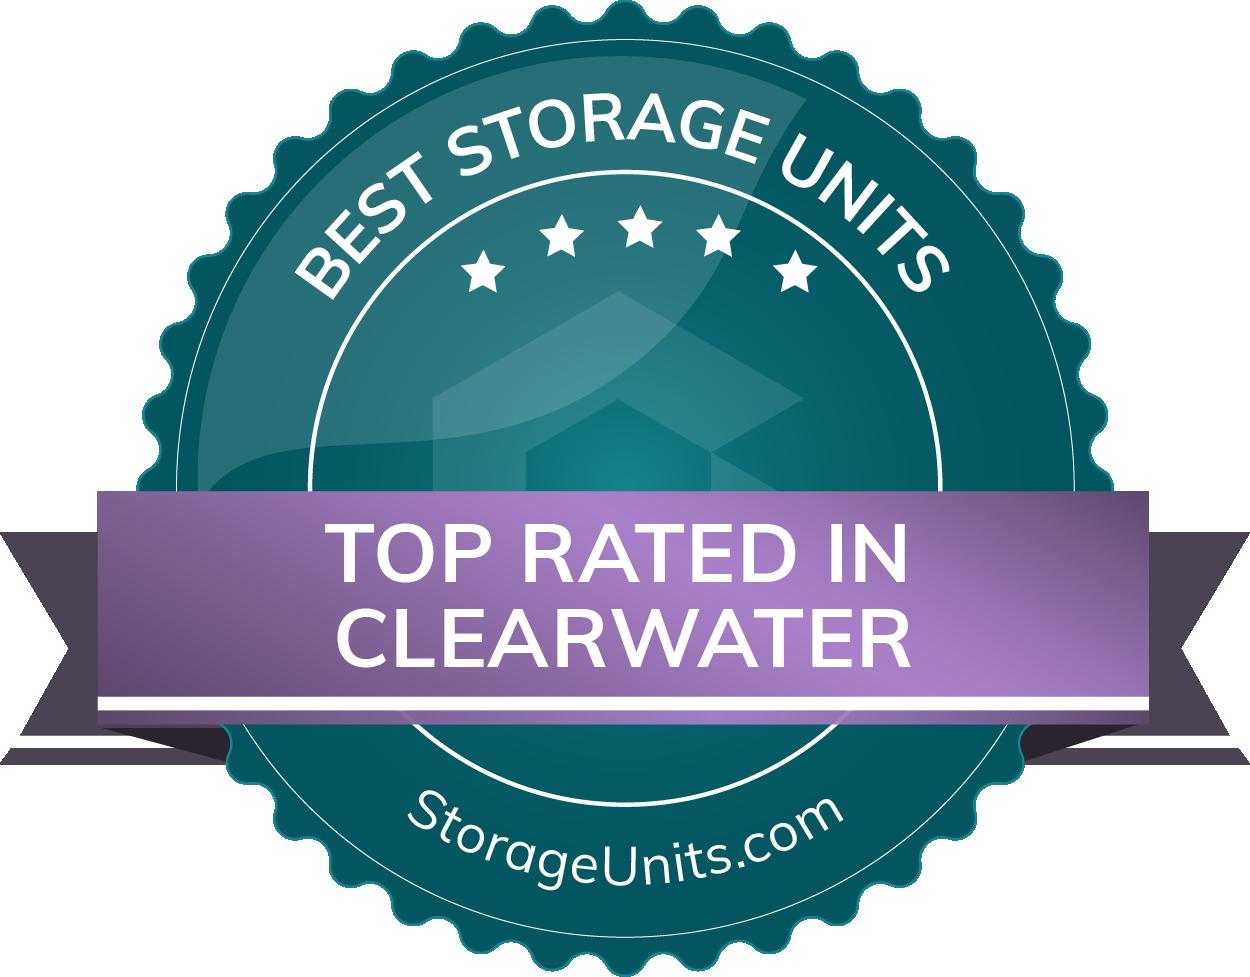 Best Self Storage Units in Clearwater, FL